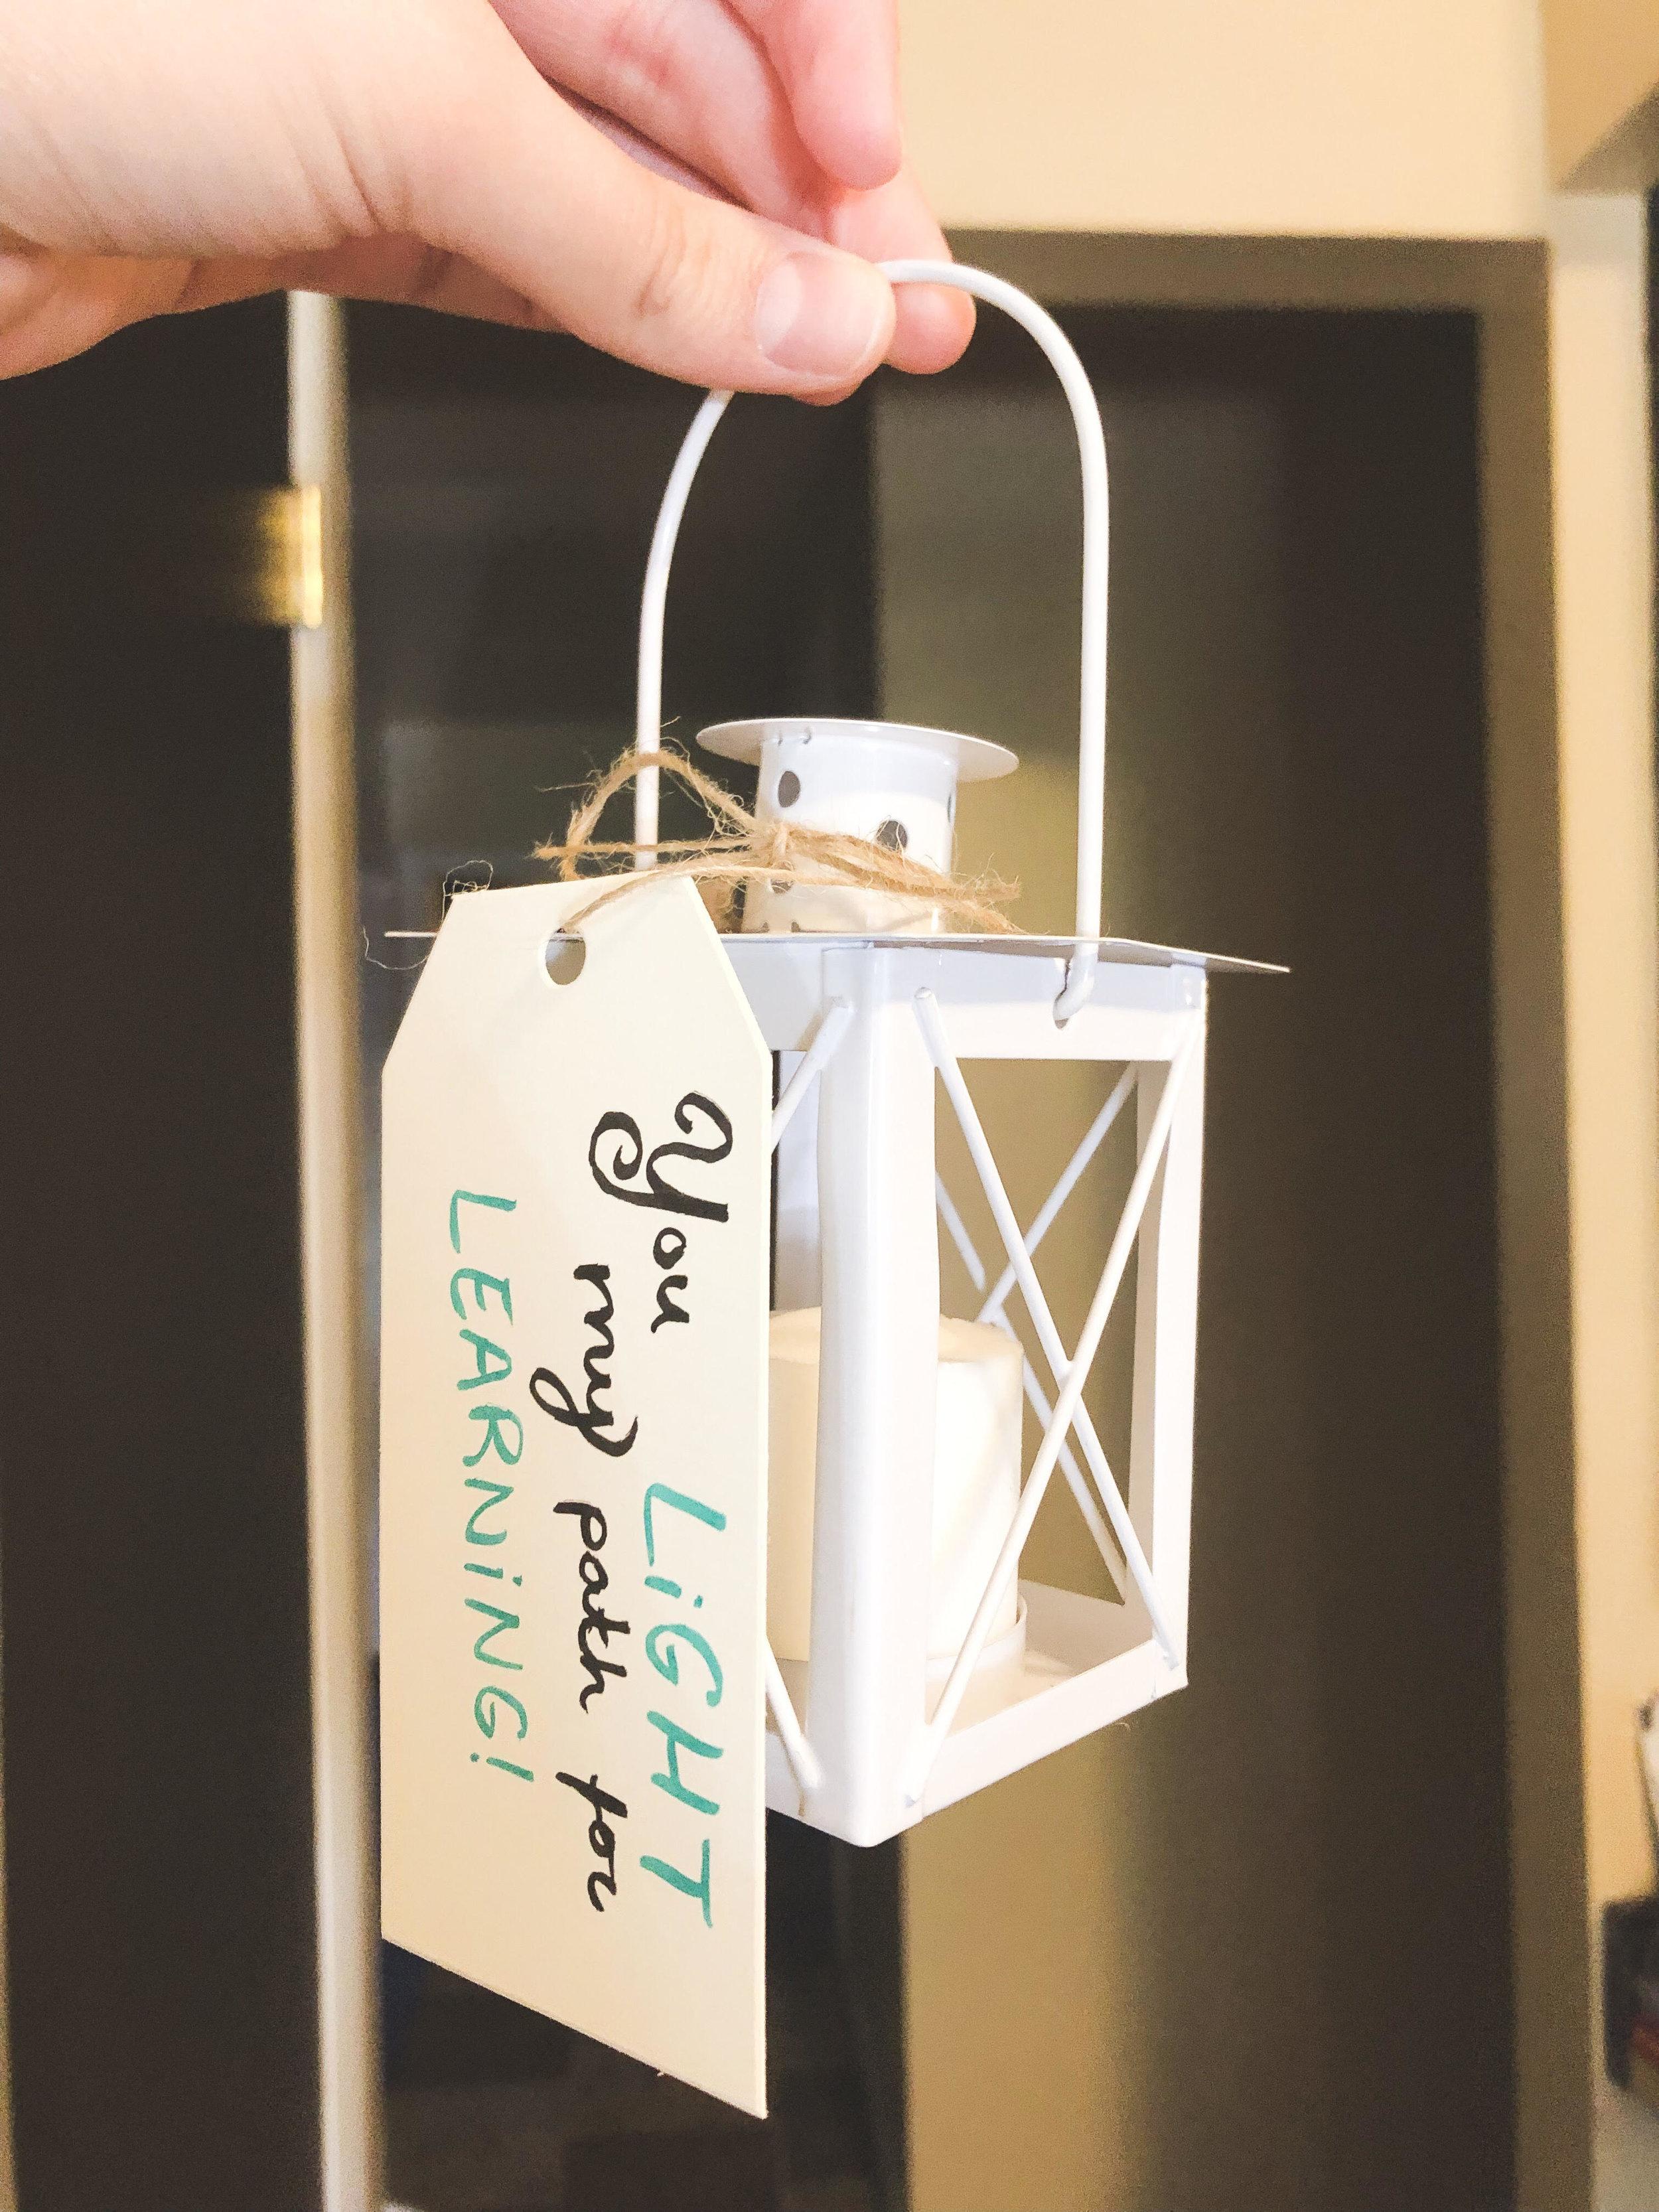 lantern teacher gift you light my path for learning